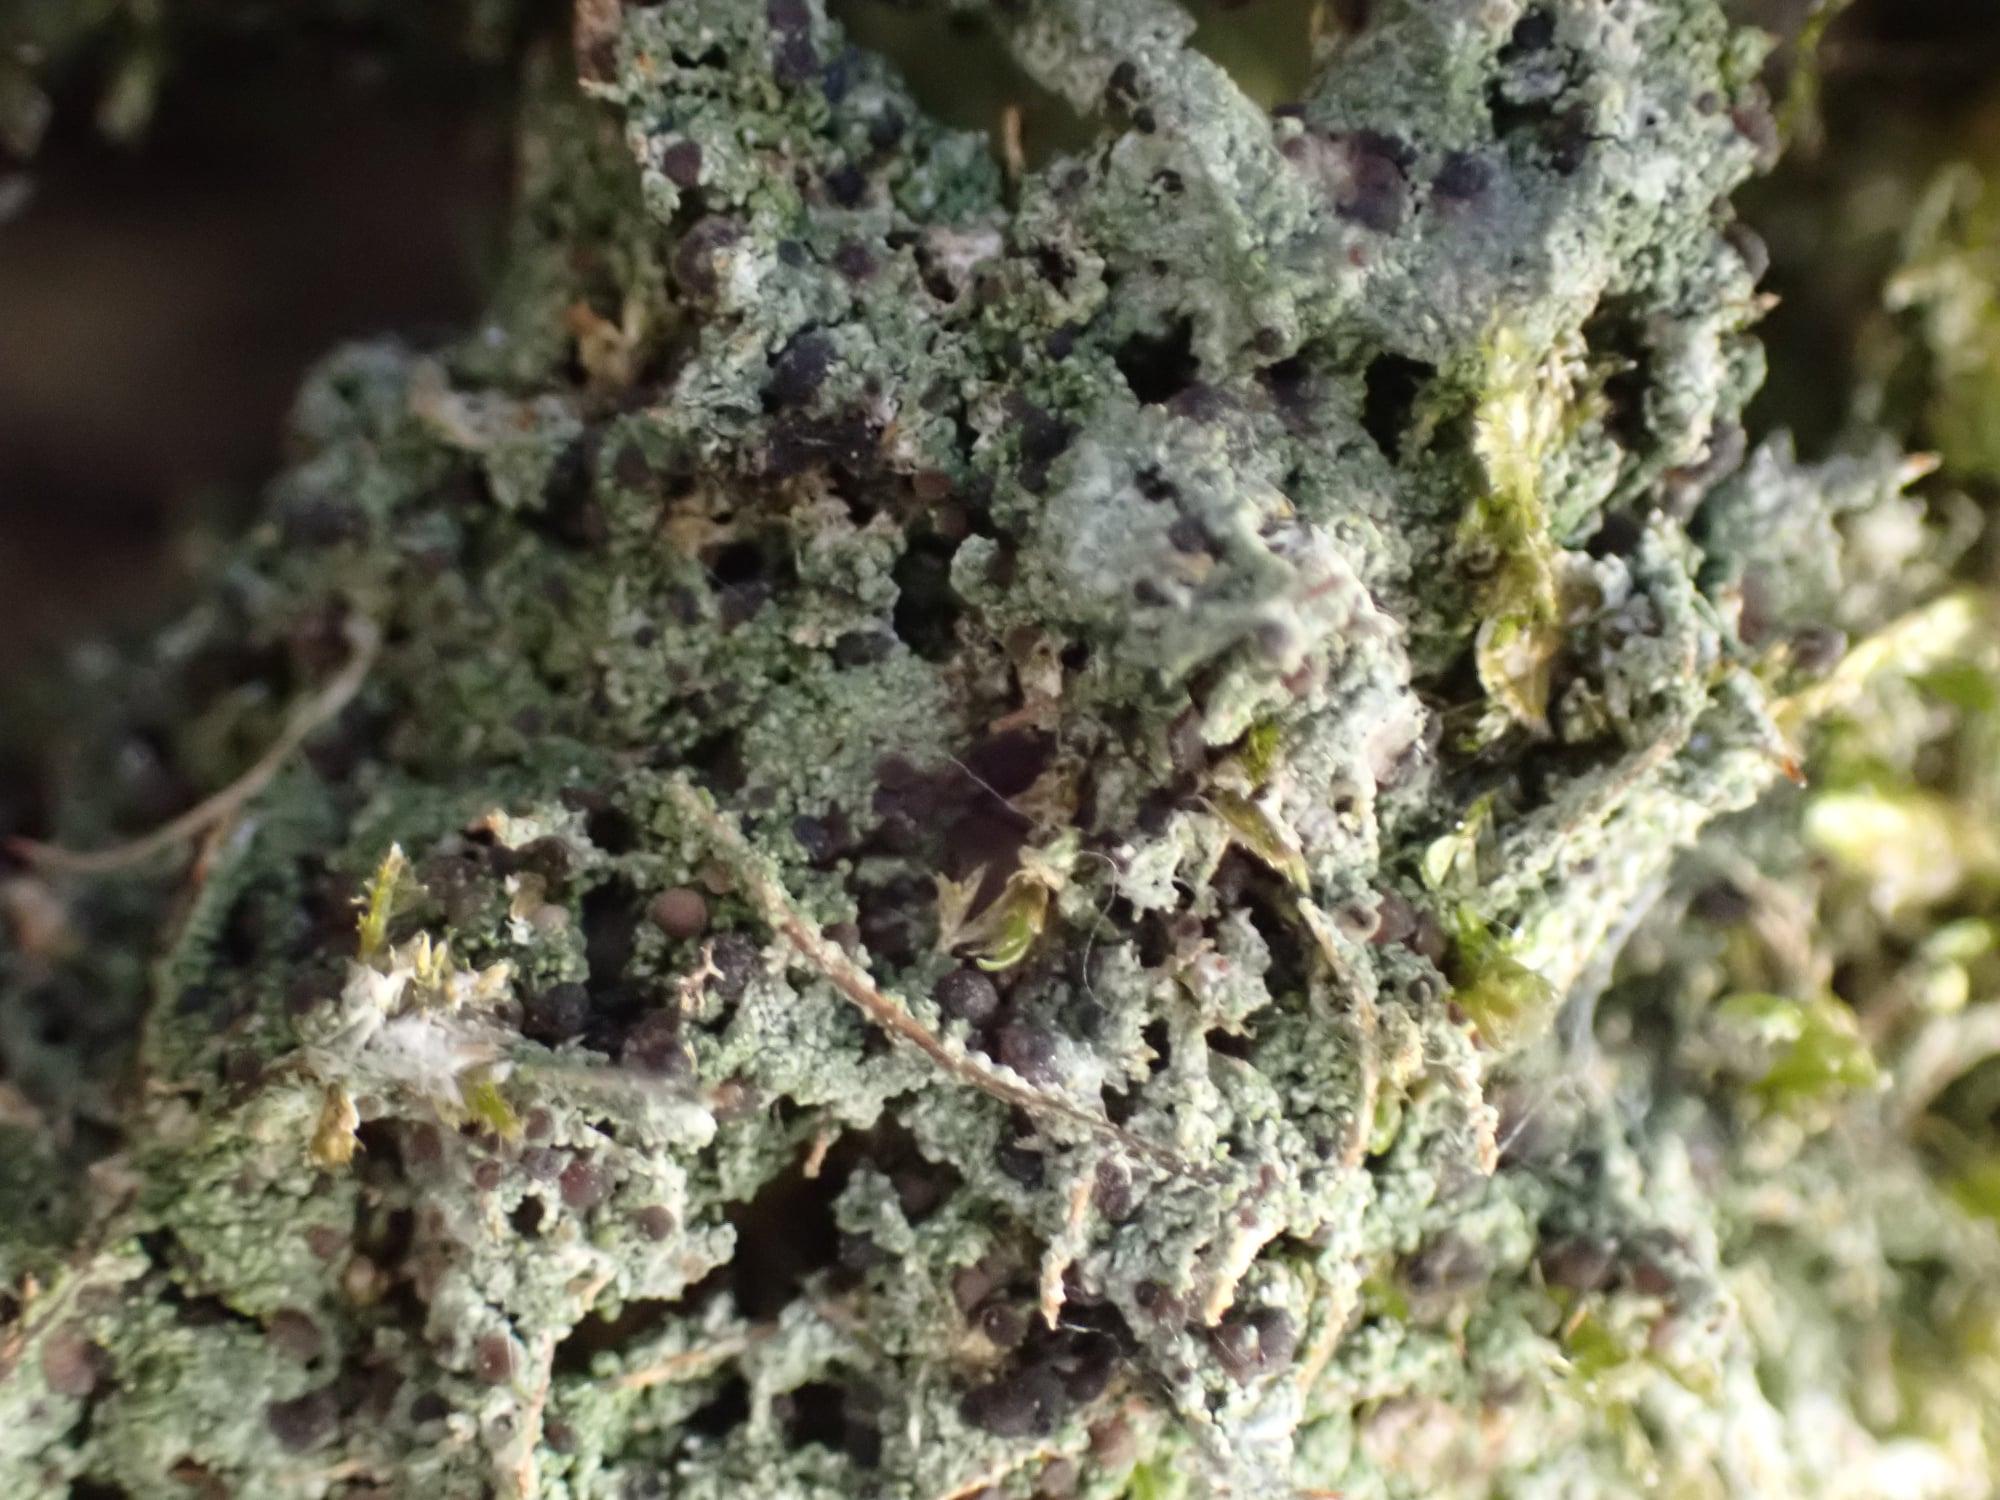 Bilimbia sabuletorum